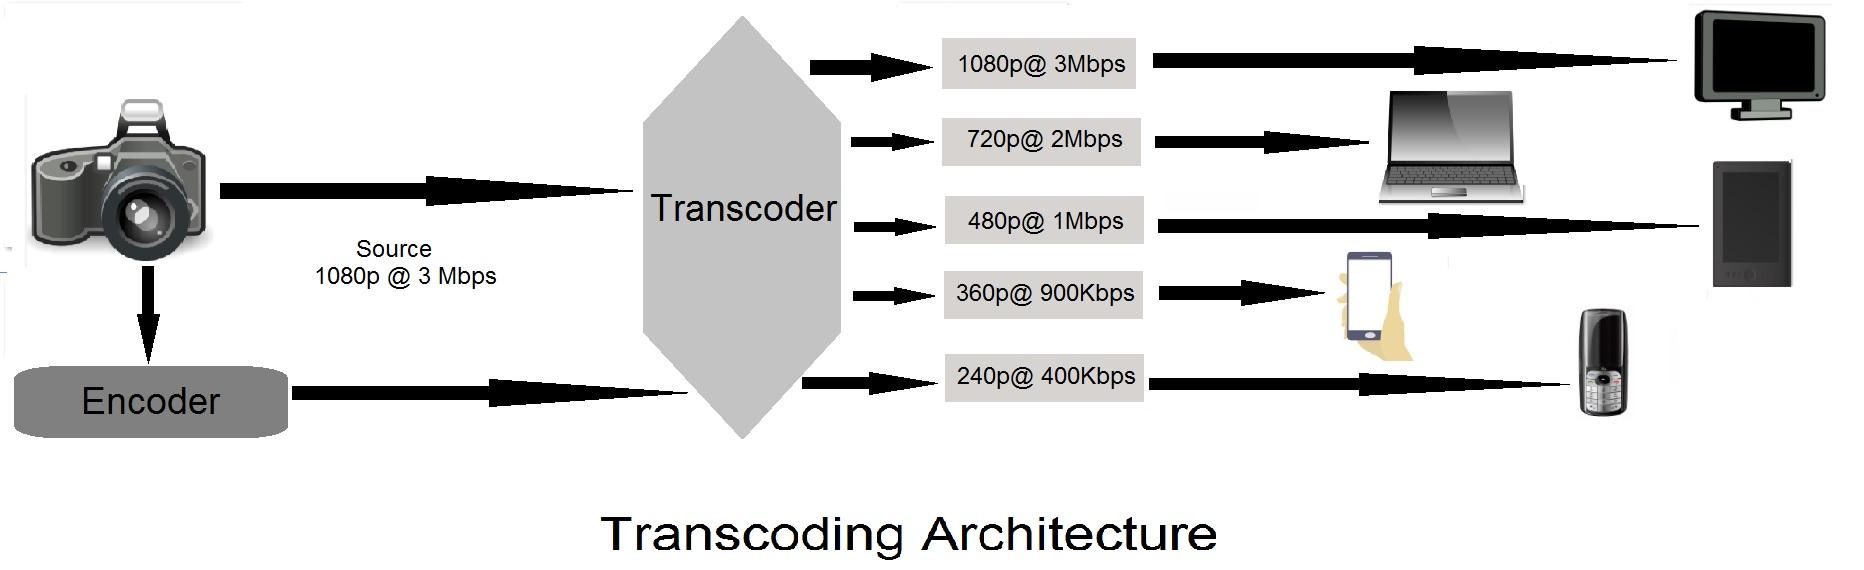 transcoding architecture